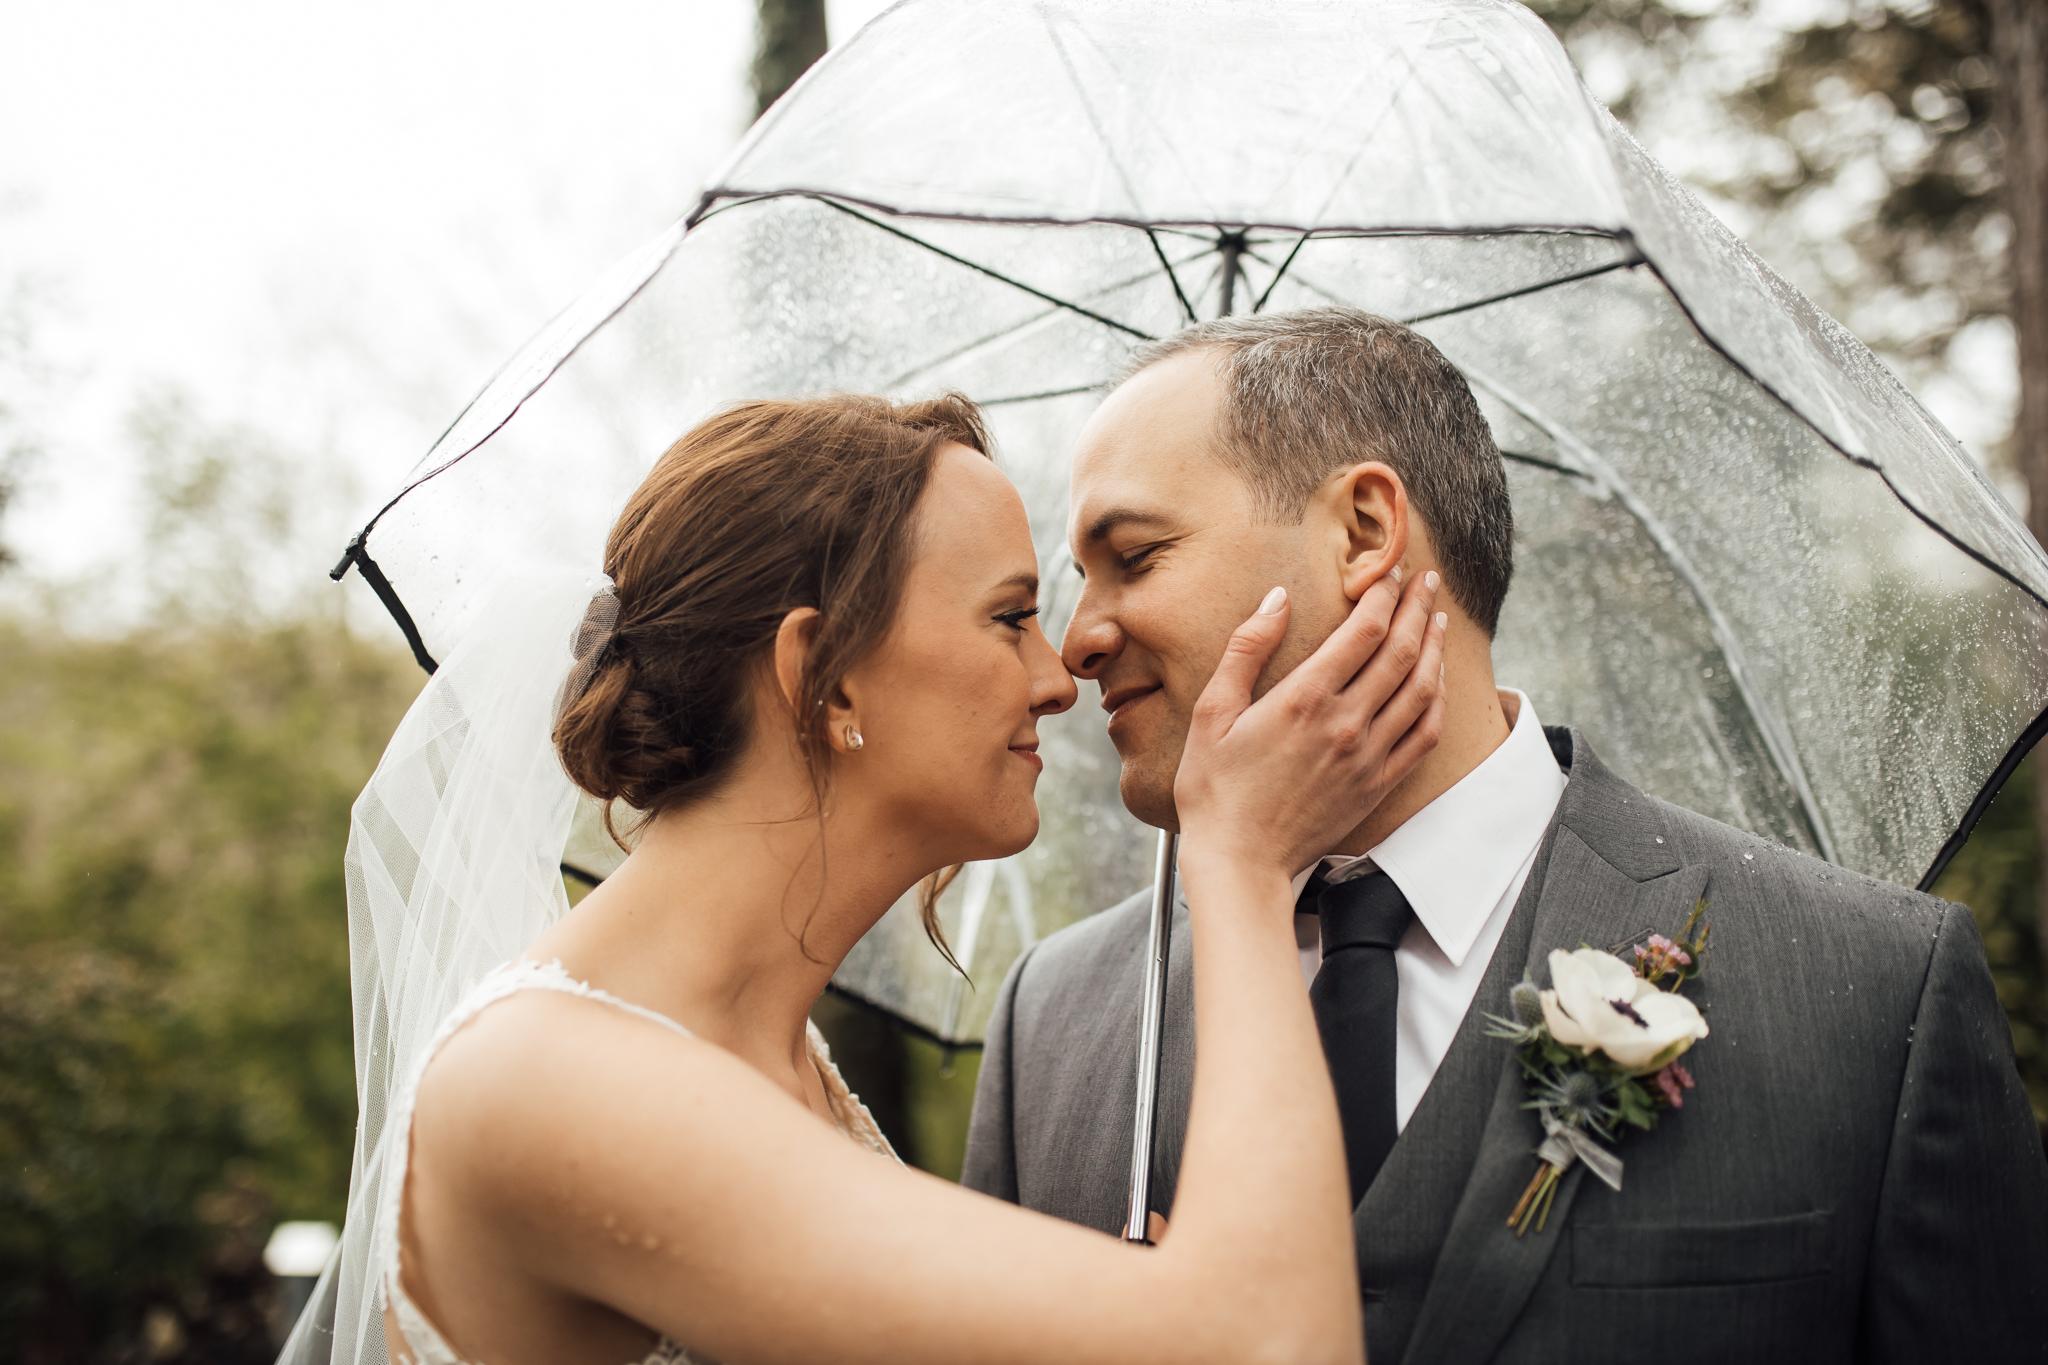 birmingham-alabama-wedding-photographer-laura-terry-the-warmth-around-you (63 of 110).jpg